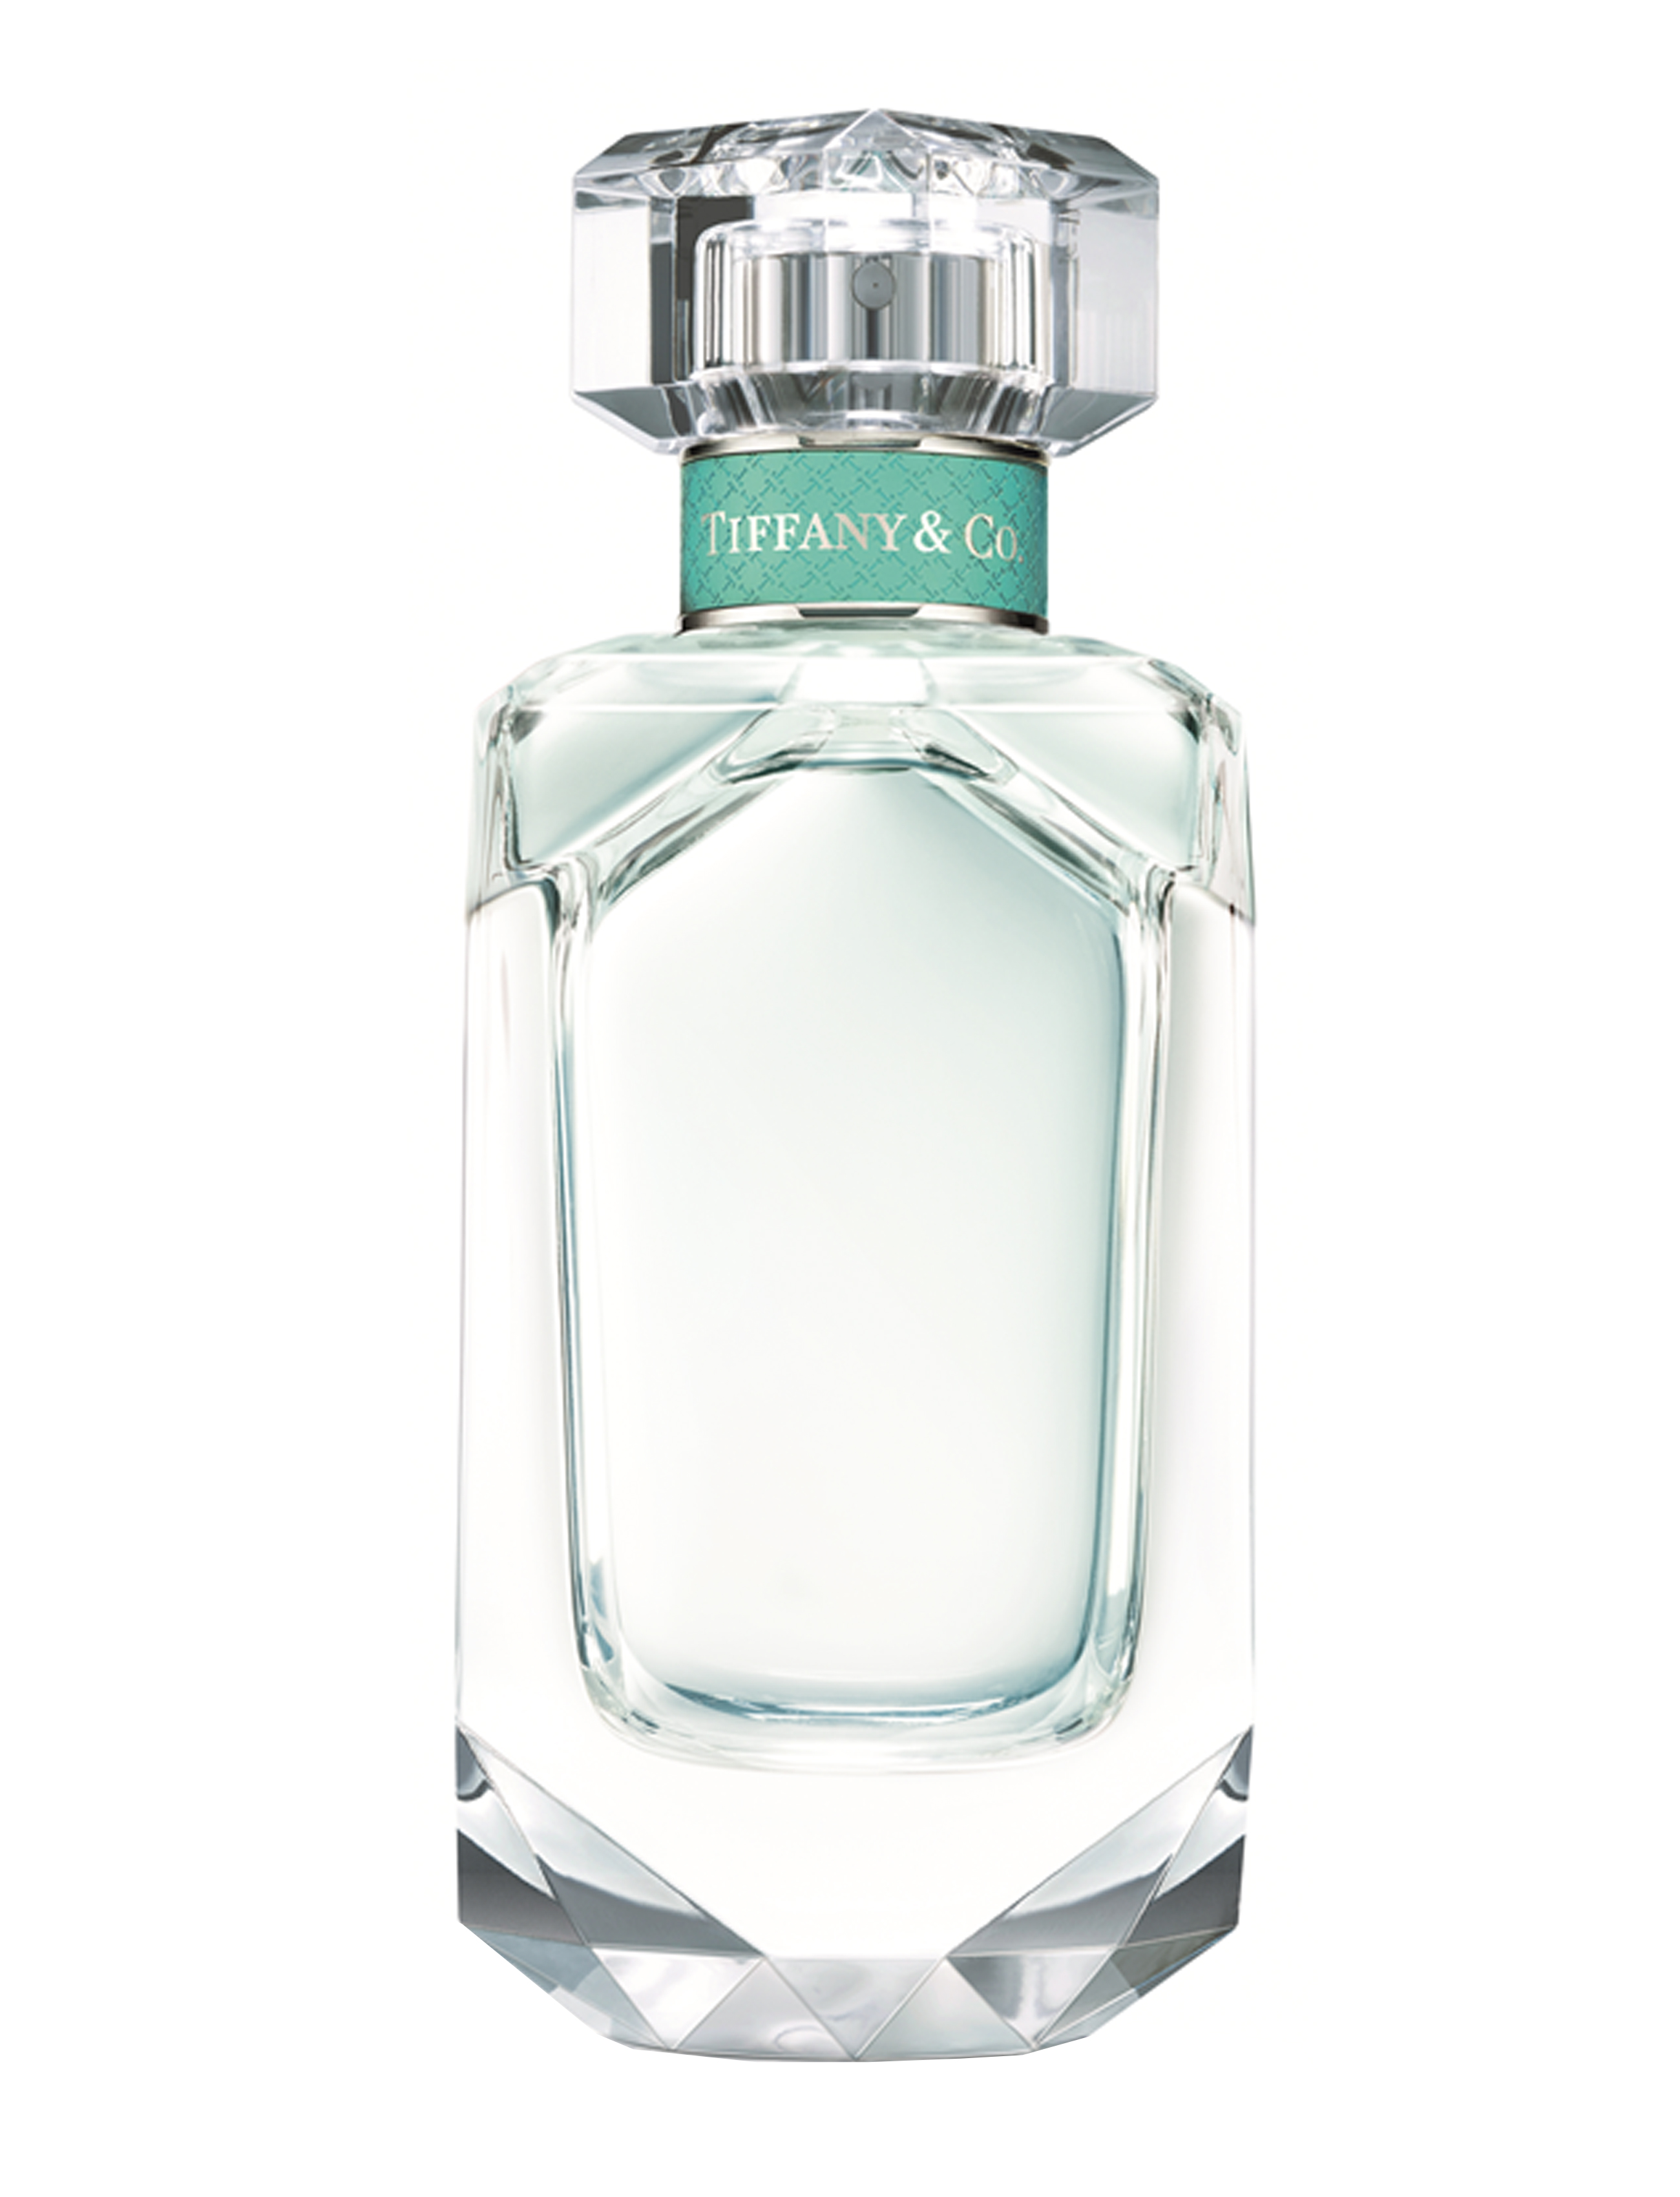 Tiffany & Co. - Eau De Parfum 50 ml